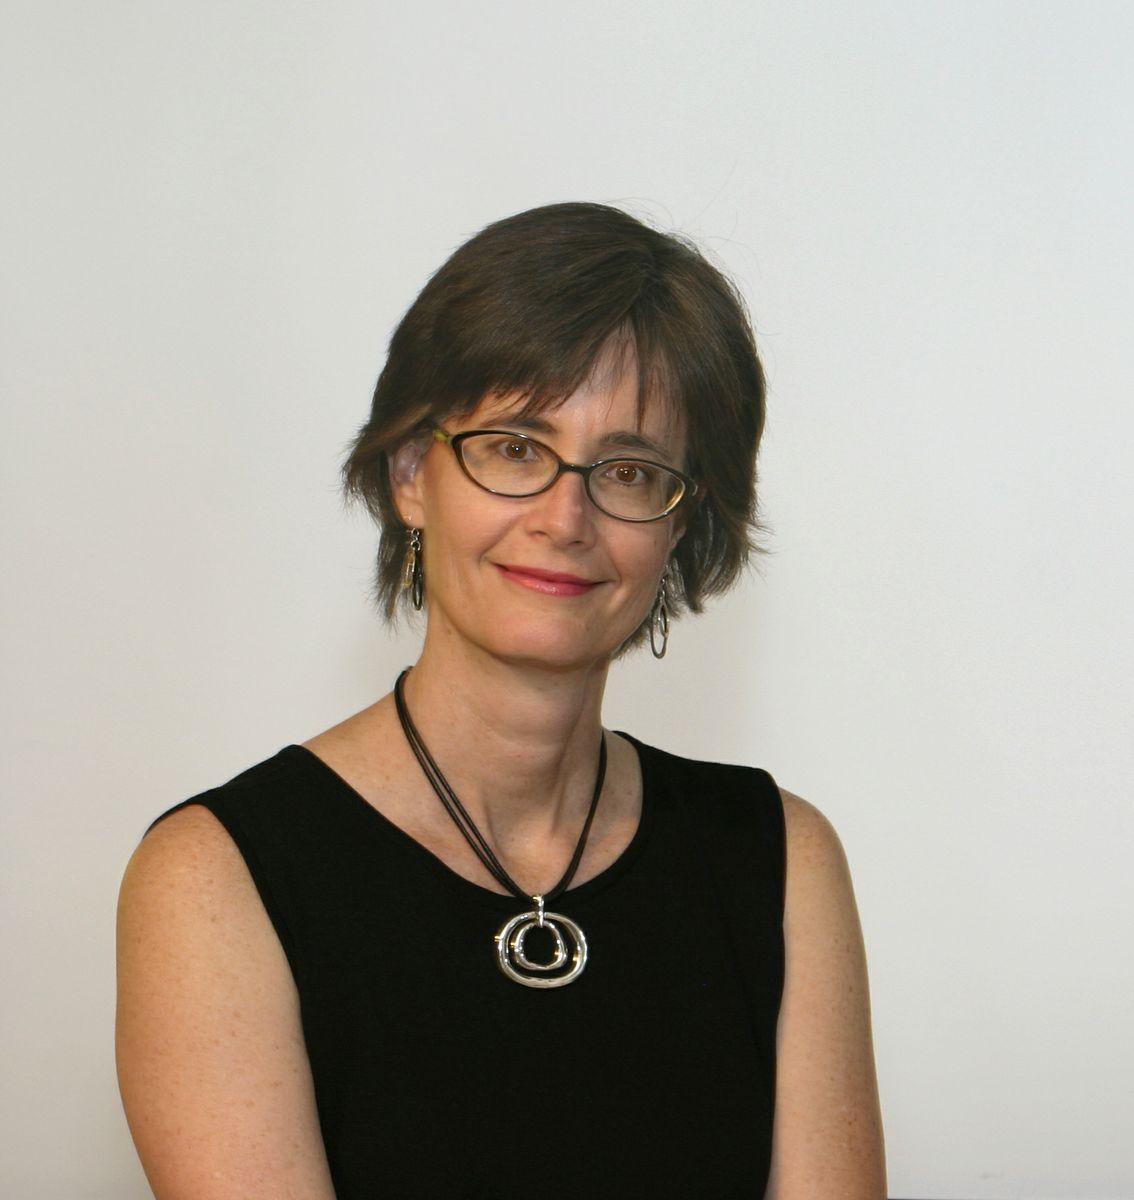 Beth Jamieson